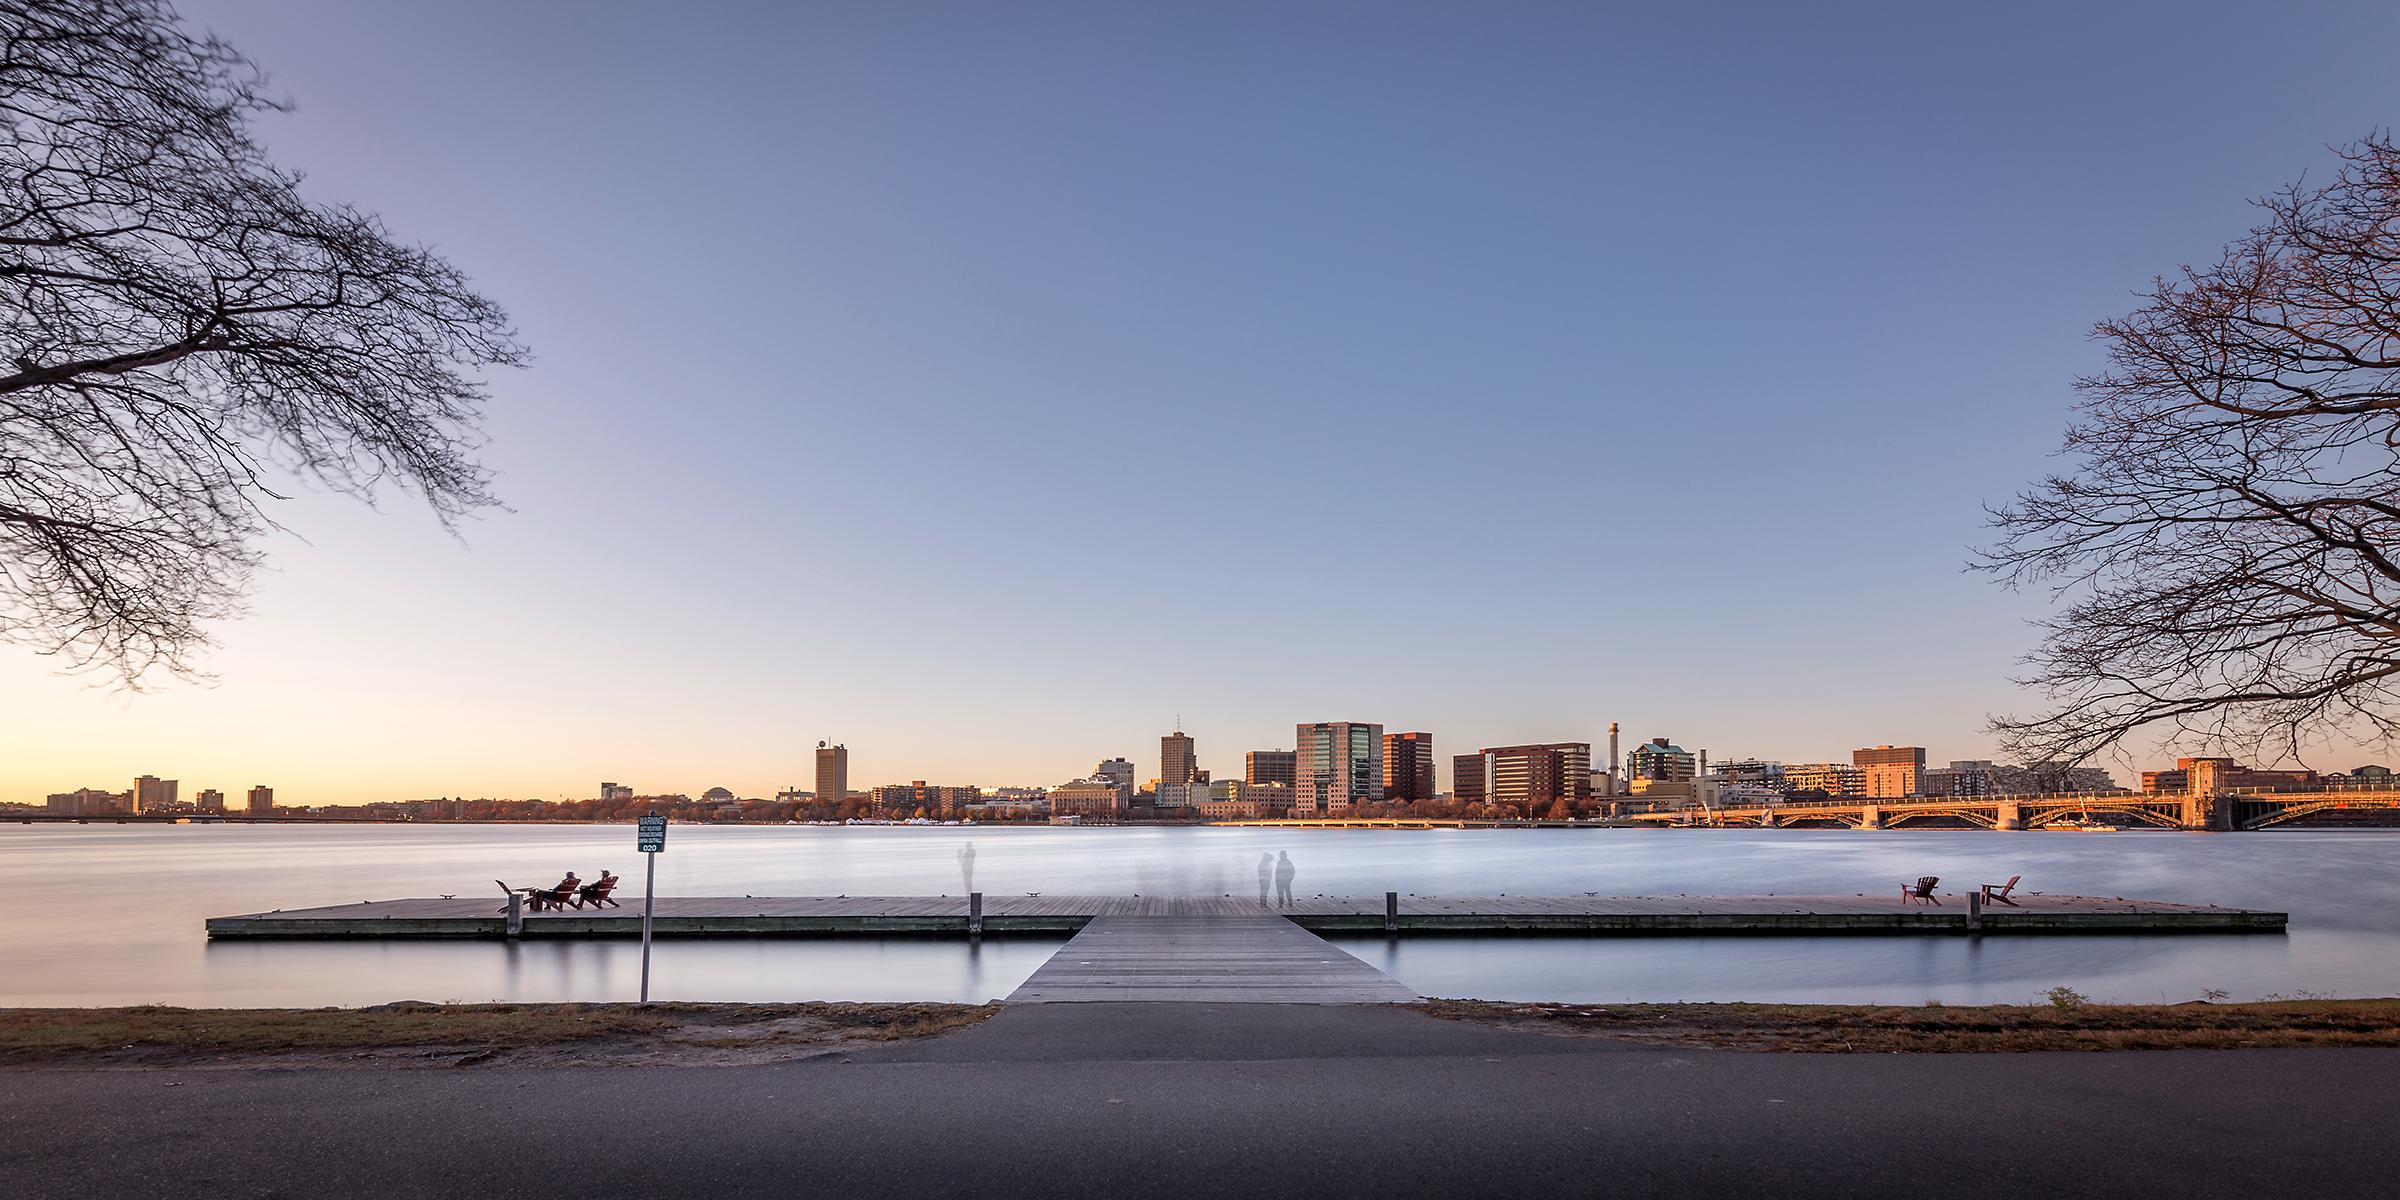 Charles River esplanade, Boston